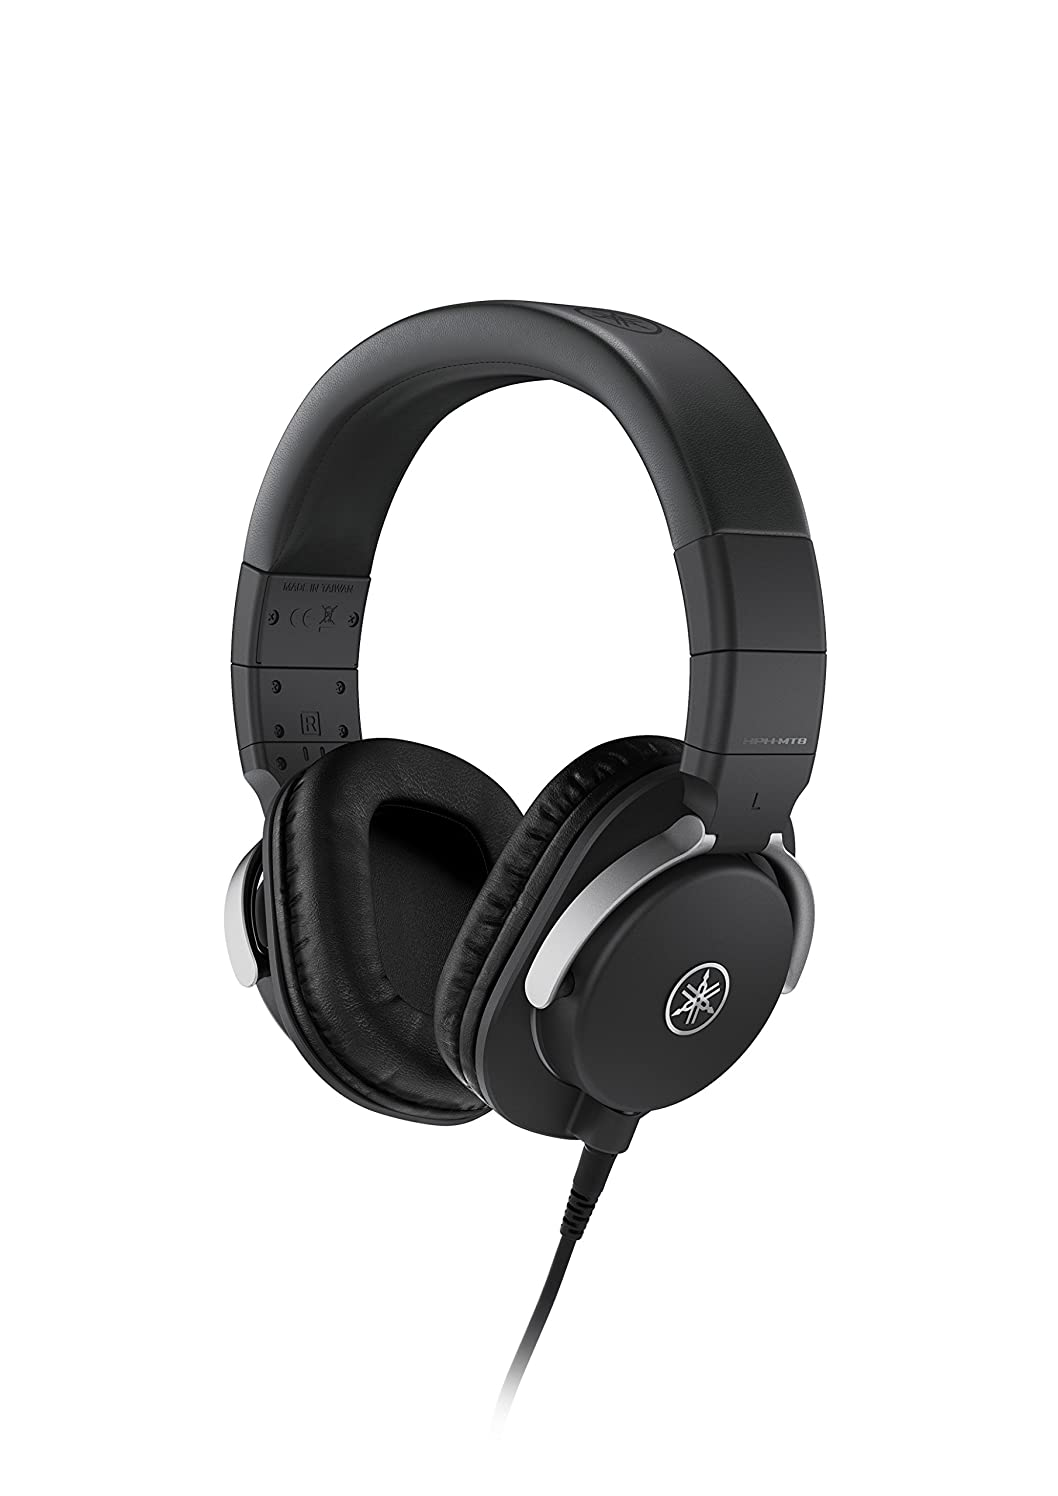 Yamaha HPH-MT8 Monitor Headphones, Black